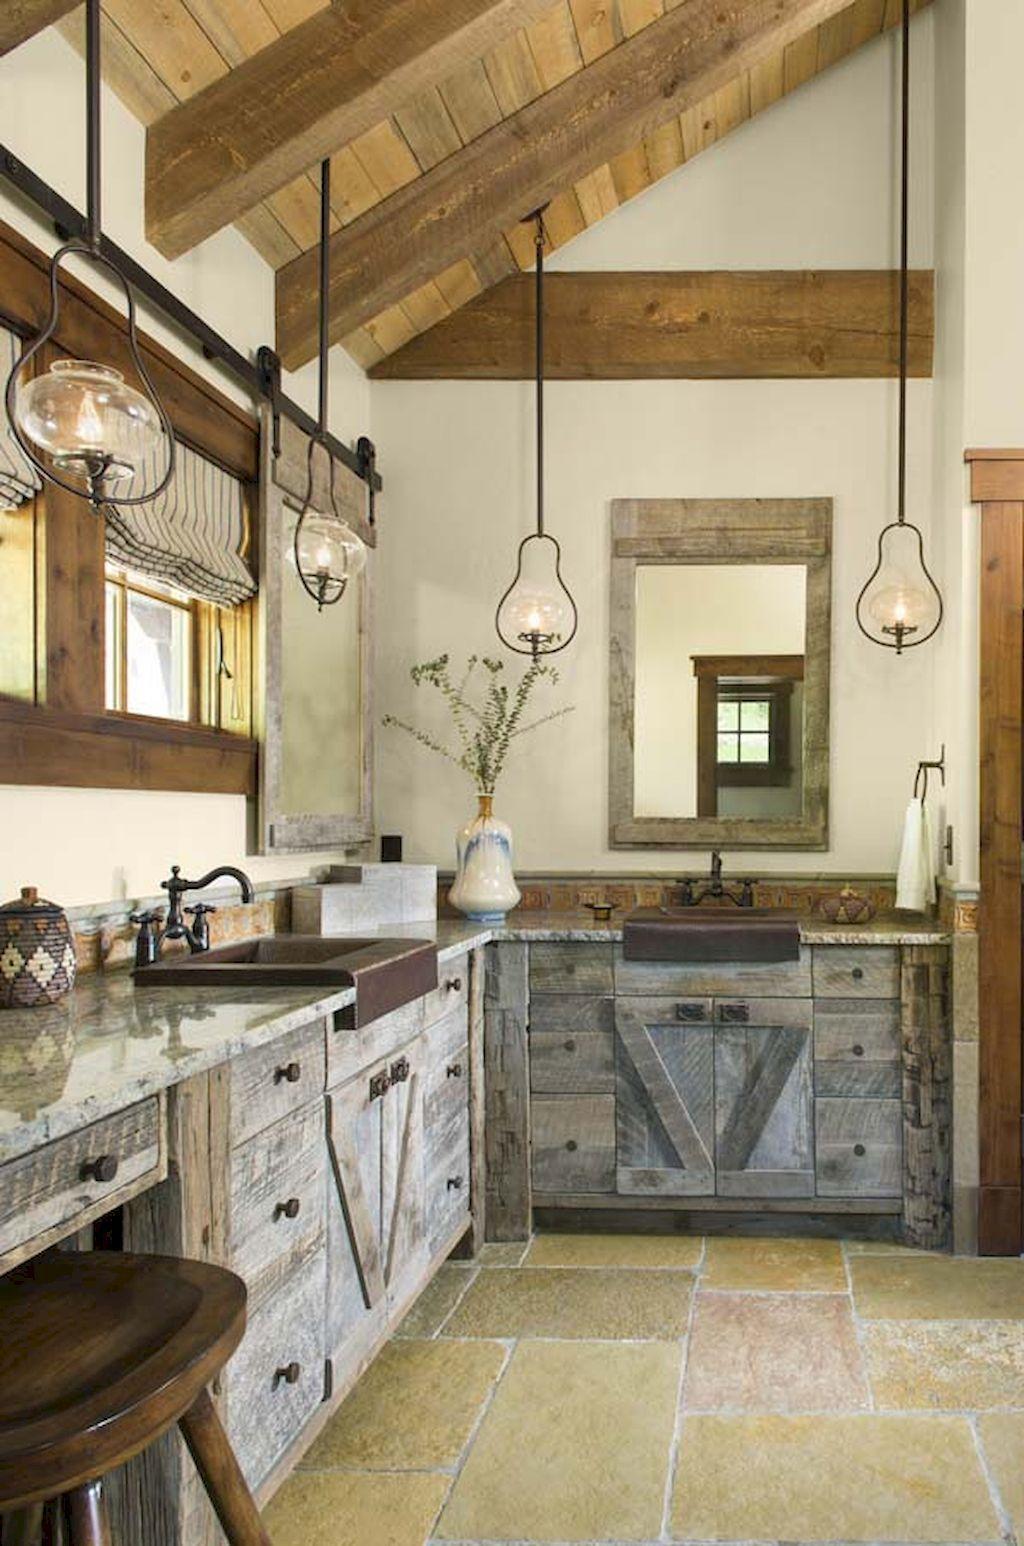 90 Rustic Kitchen Cabinets Farmhouse Style Ideas 37 Farmhouse